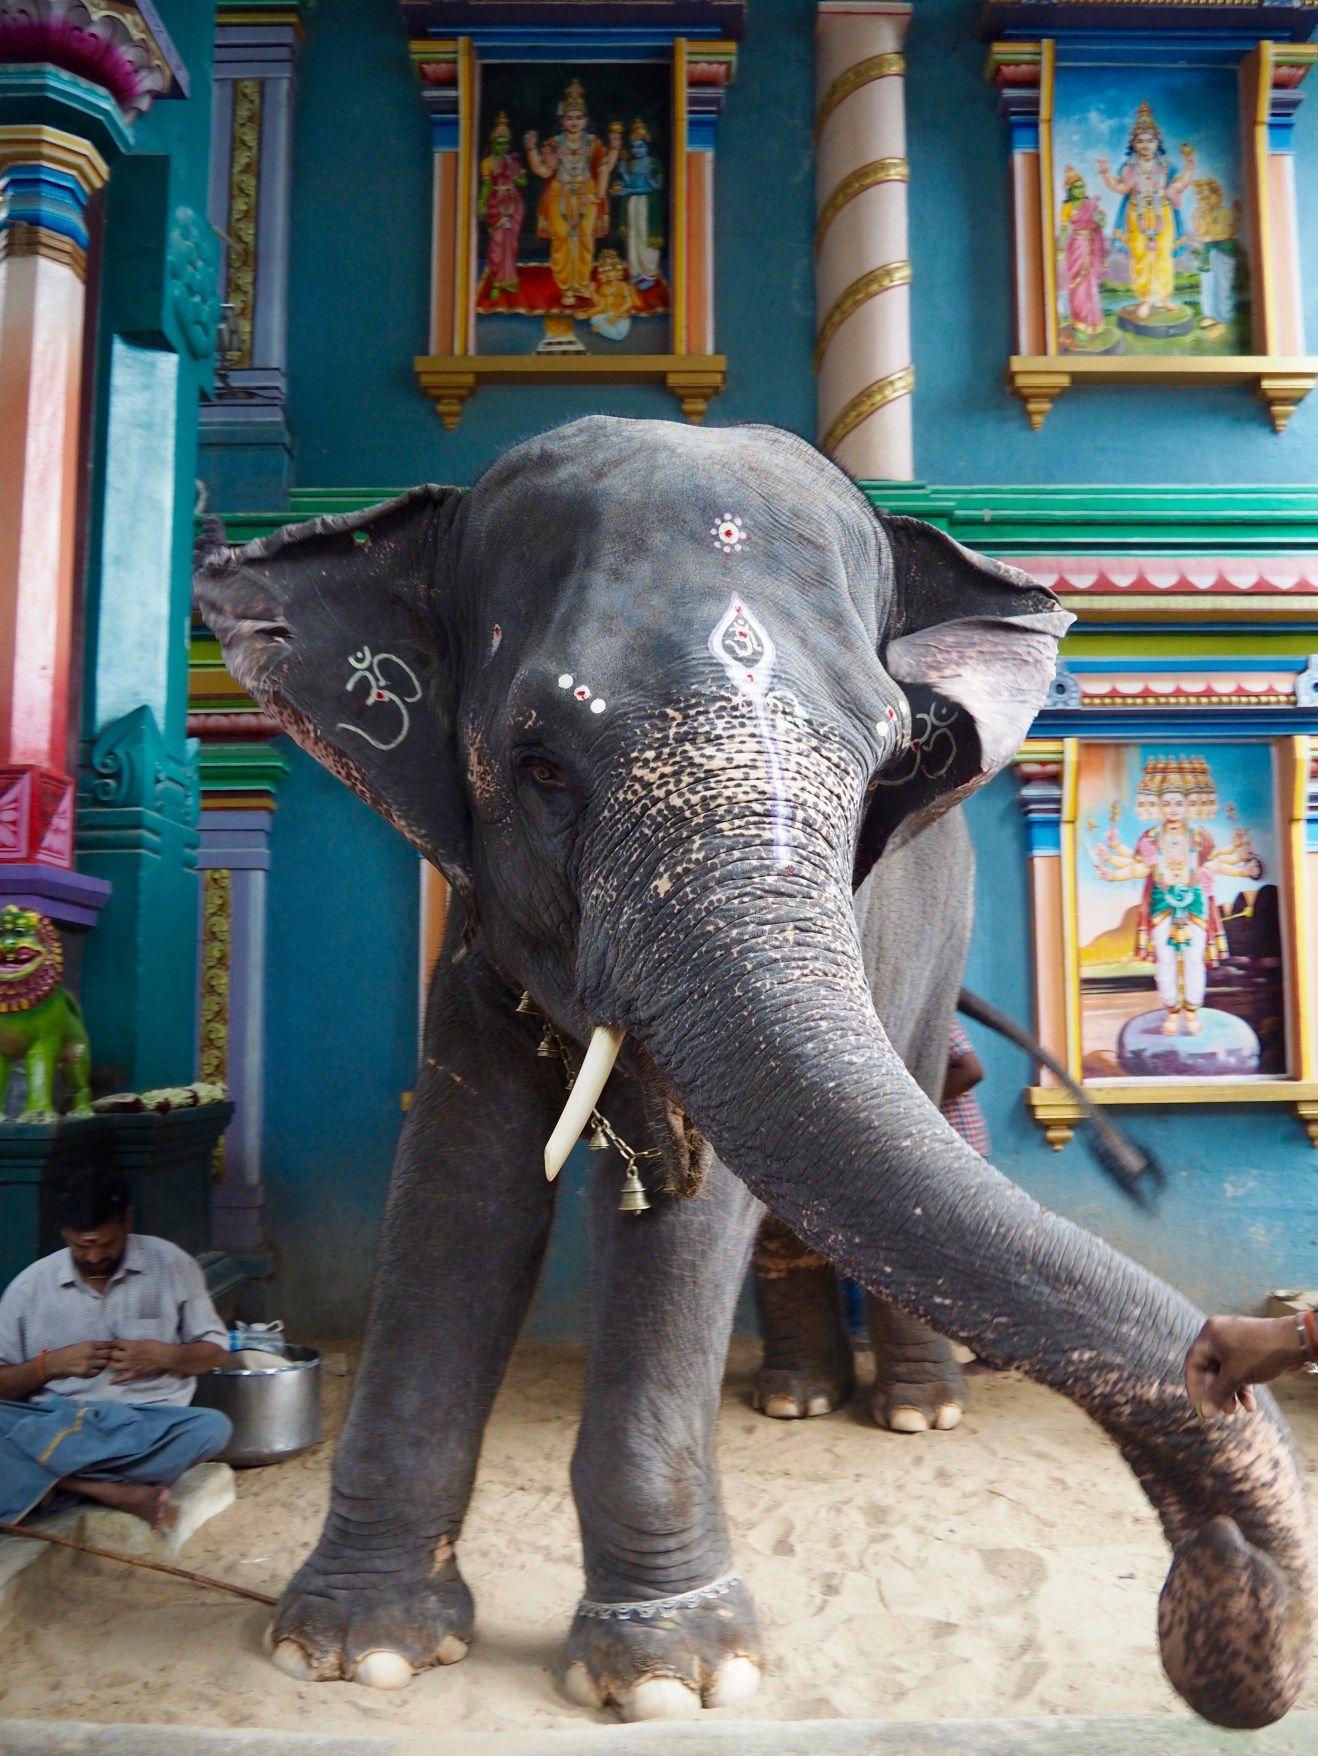 The Ultimate Pondicherry Travel Guide For India Top Things To Do In This Amazing Beach Town Met Afbeeldingen Rondreizen Reizen Bezienswaardigheden